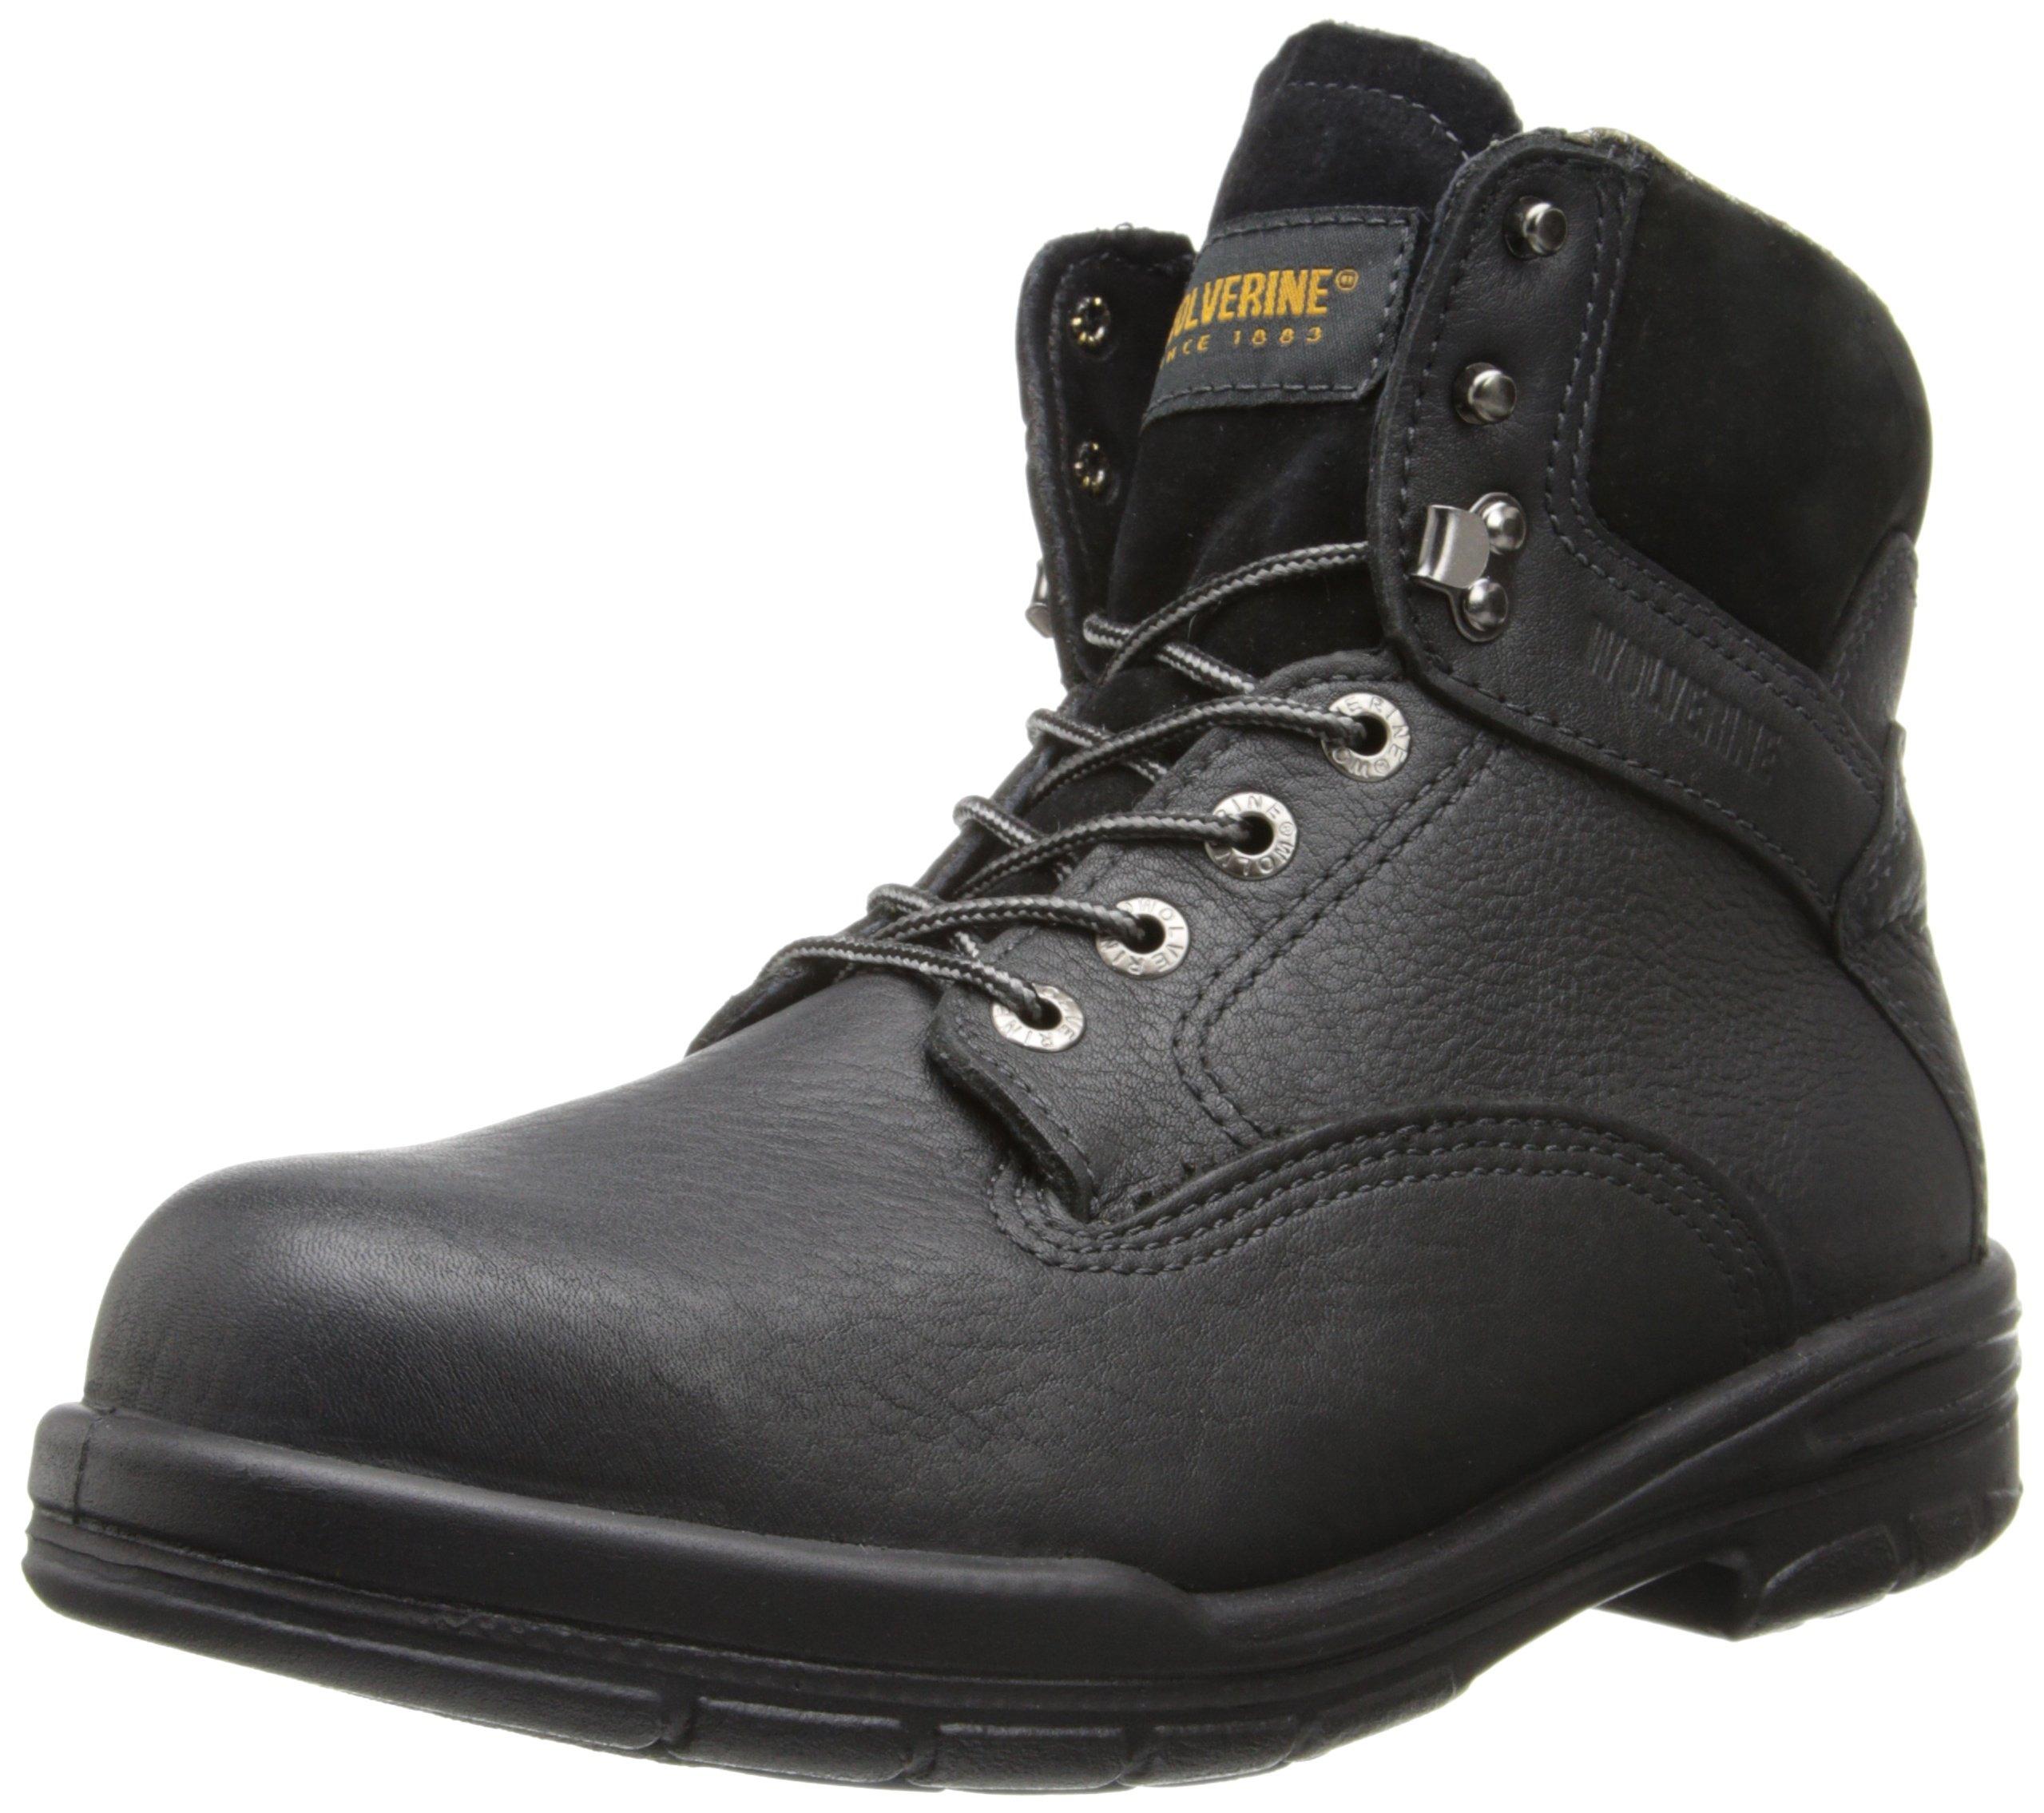 Wolverine Men's SR Durashock DS MNS 6 Inch Steel Toe EH Work Boot, Black, 11 M US